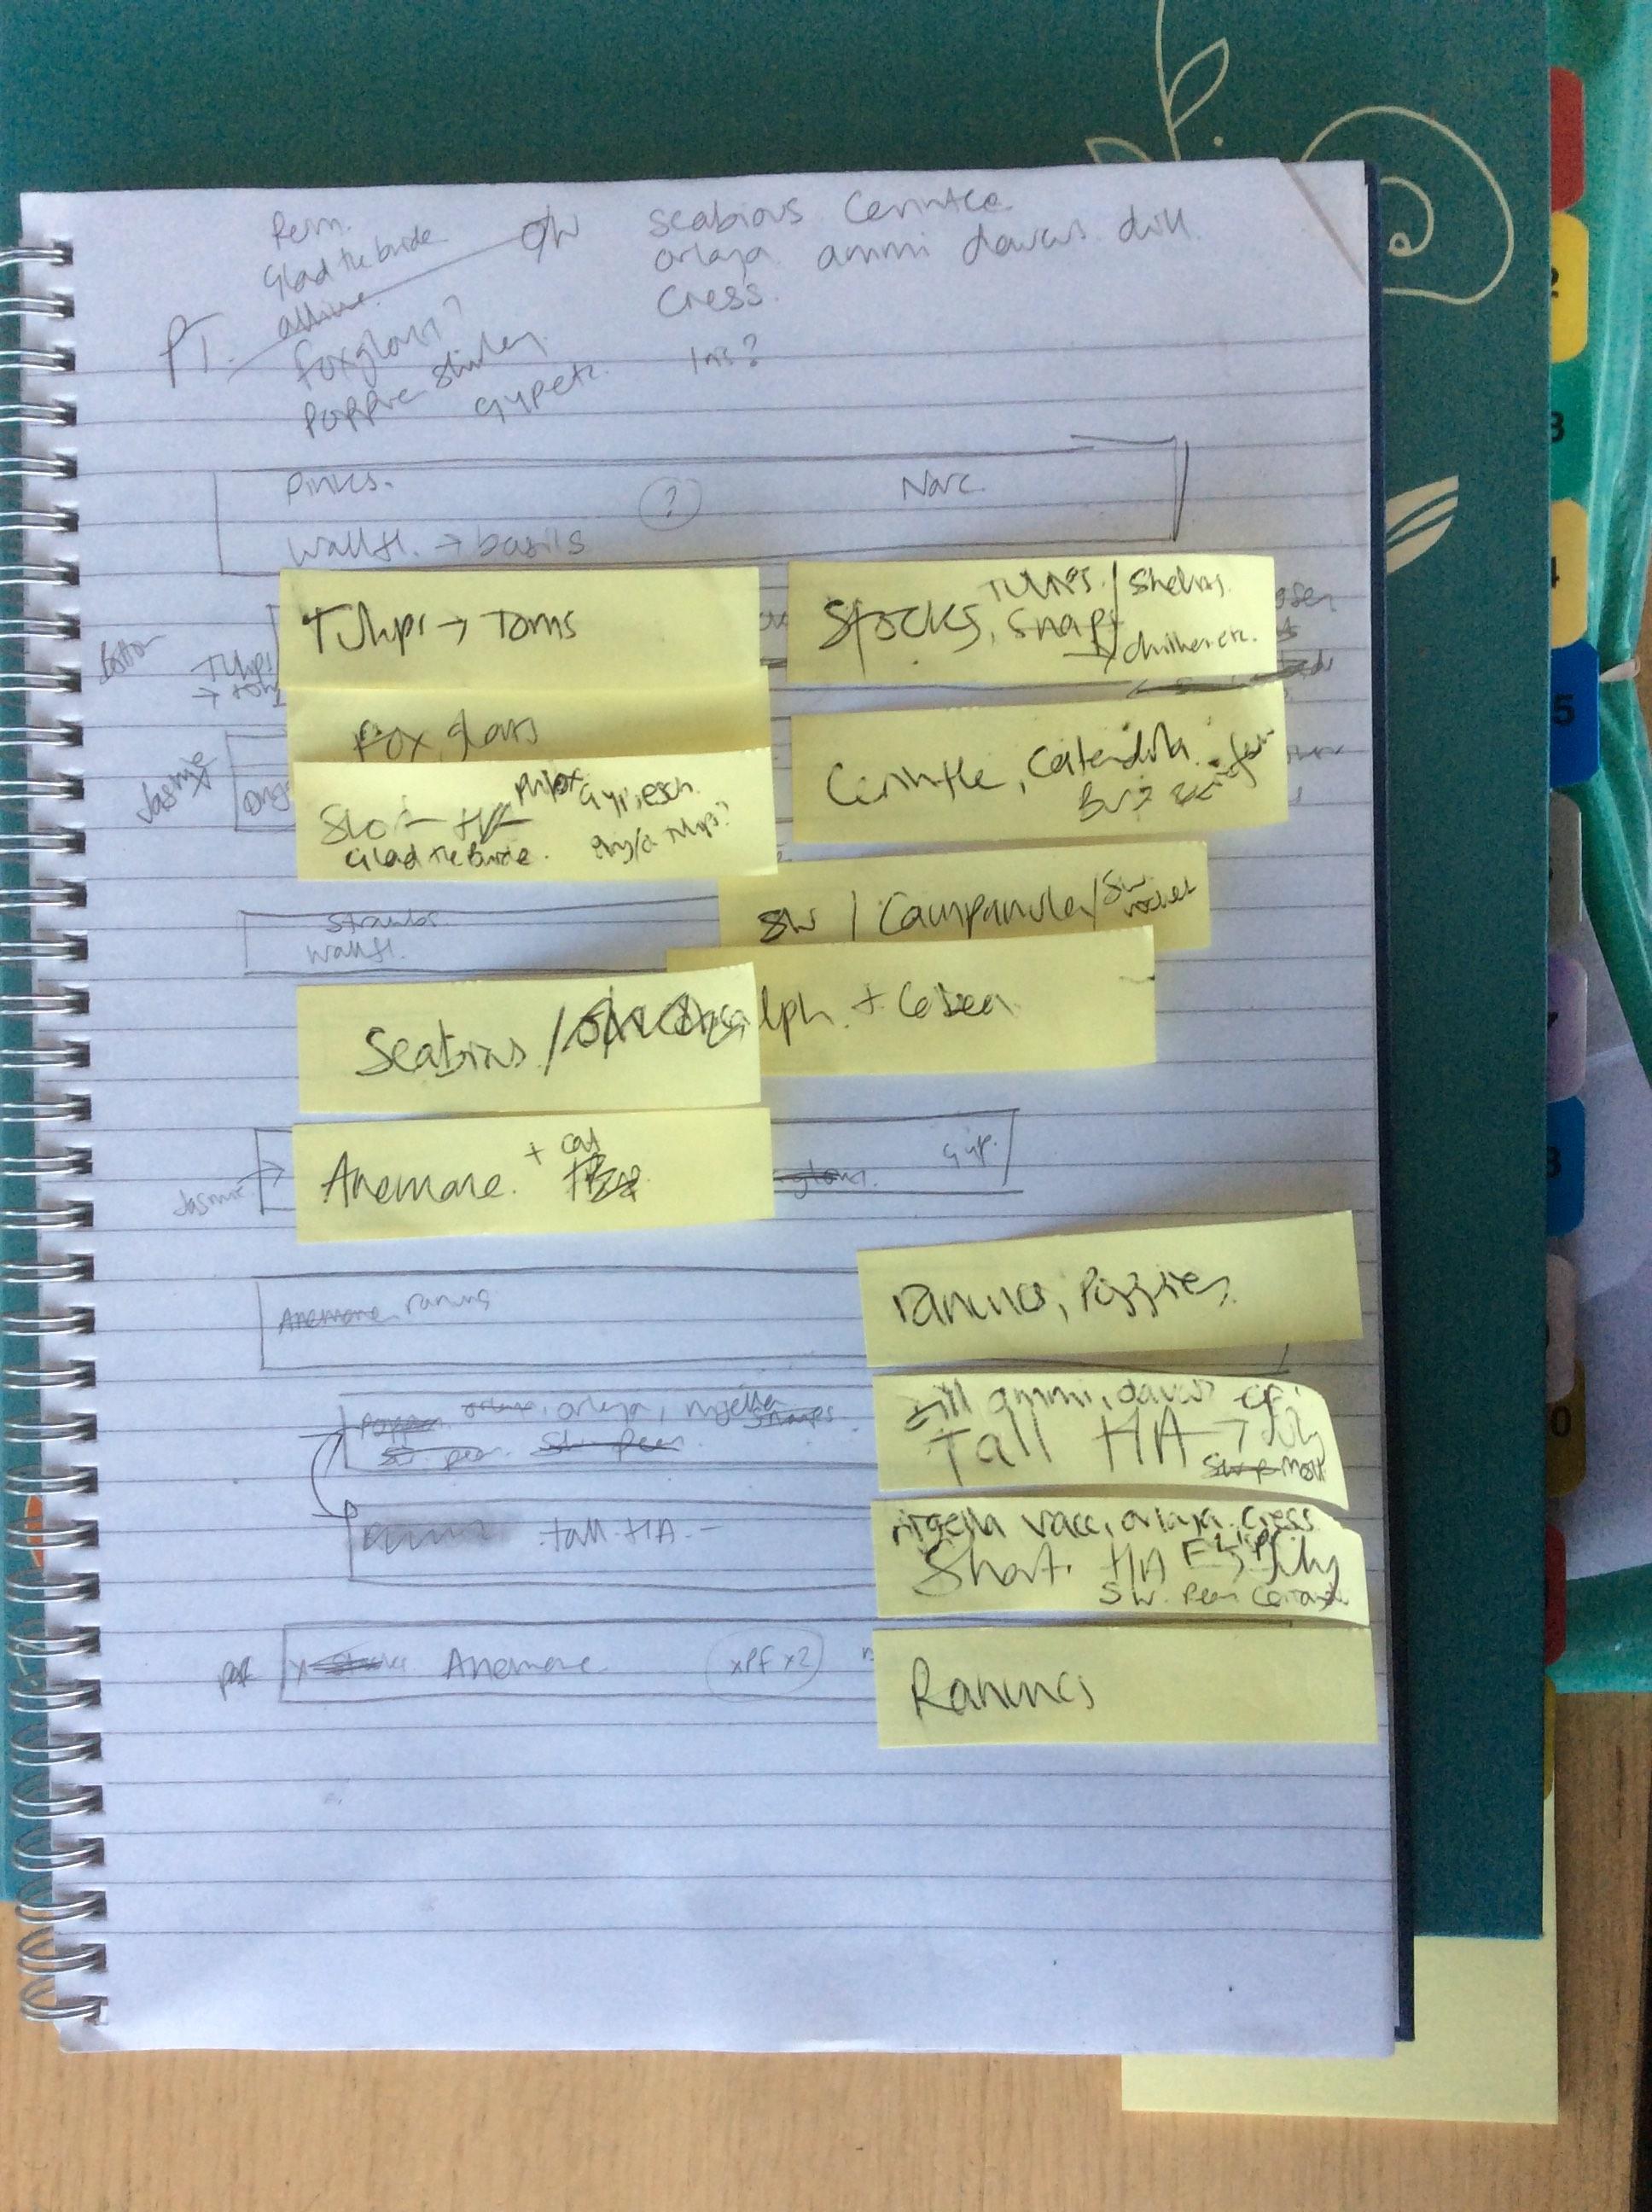 polytunnel post it note.jpg